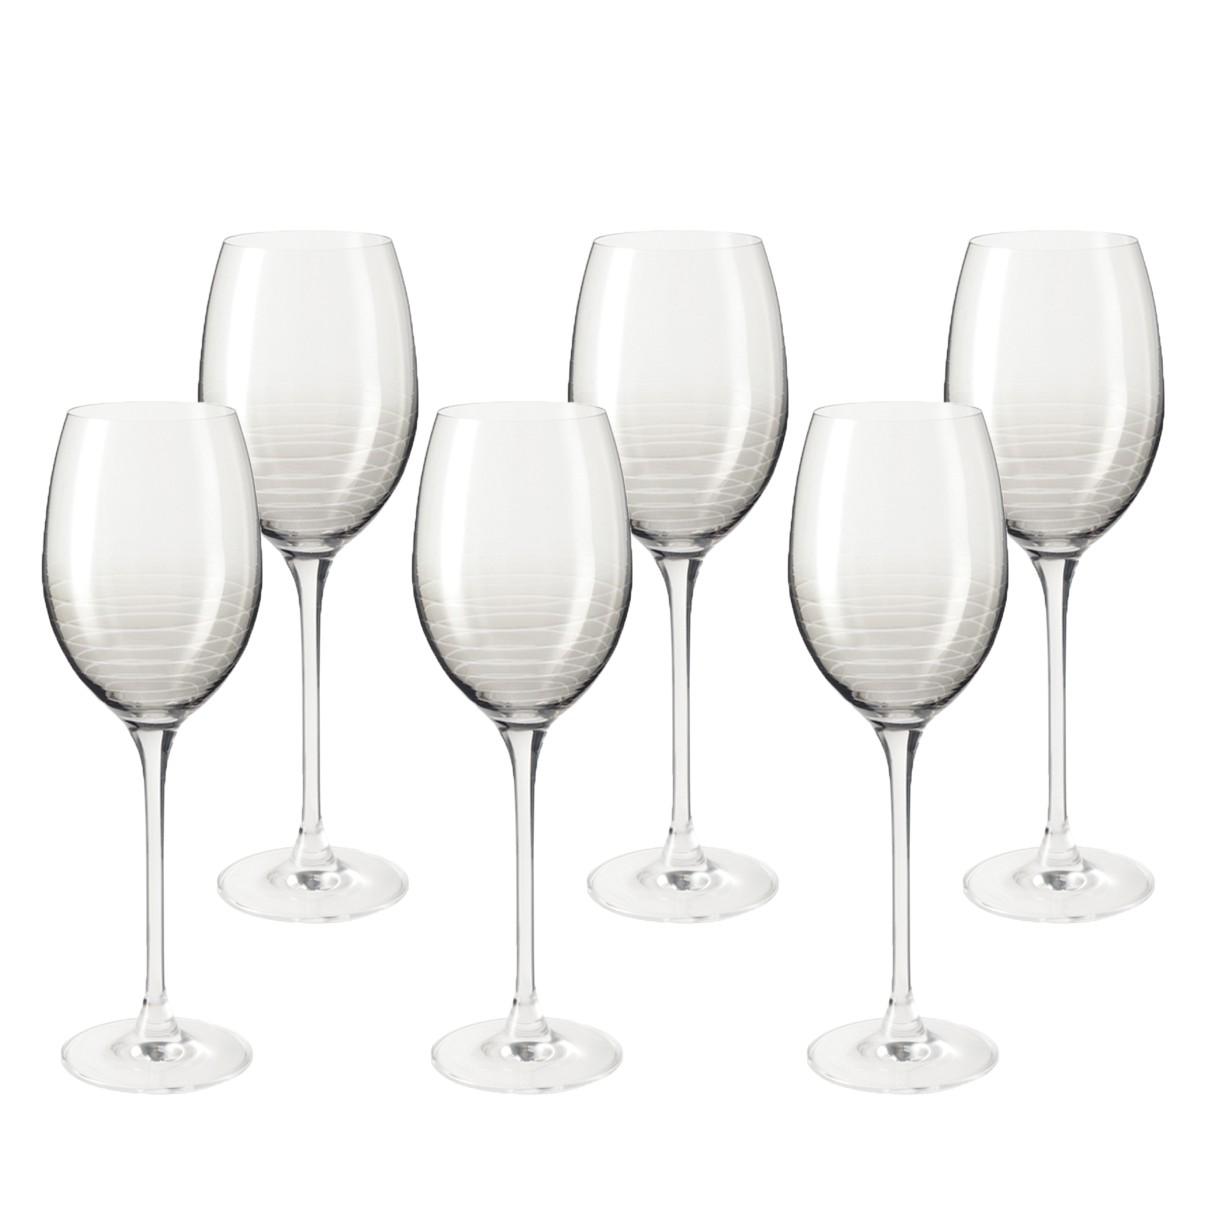 Weinglas Cheers (6er-Set) - Grau, Leonardo